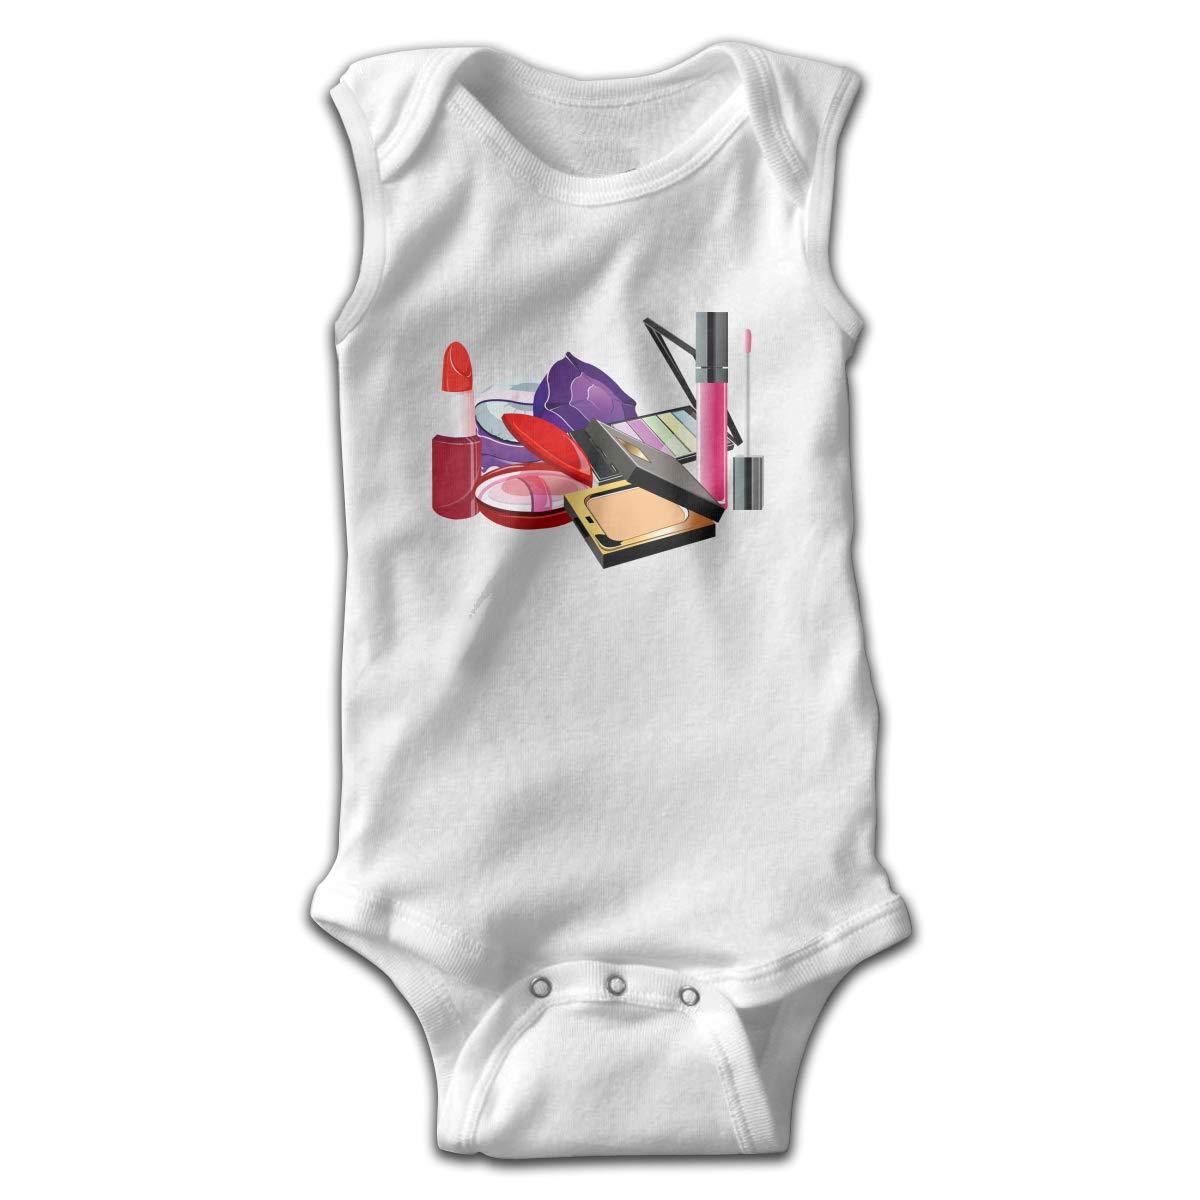 Efbj Newborn Baby Boys Rompers Sleeveless Cotton Jumpsuit,Lipstick Bodysuit Autumn Pajamas